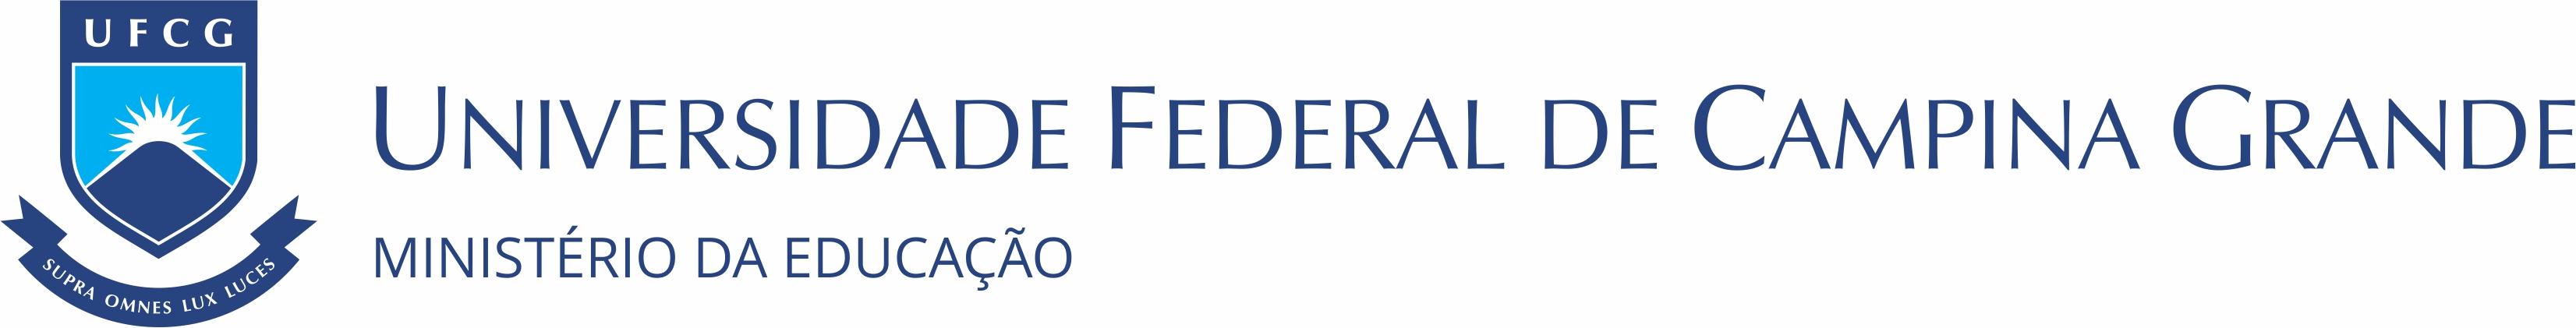 Portal da Universidade Federal de Campina Grande - PB